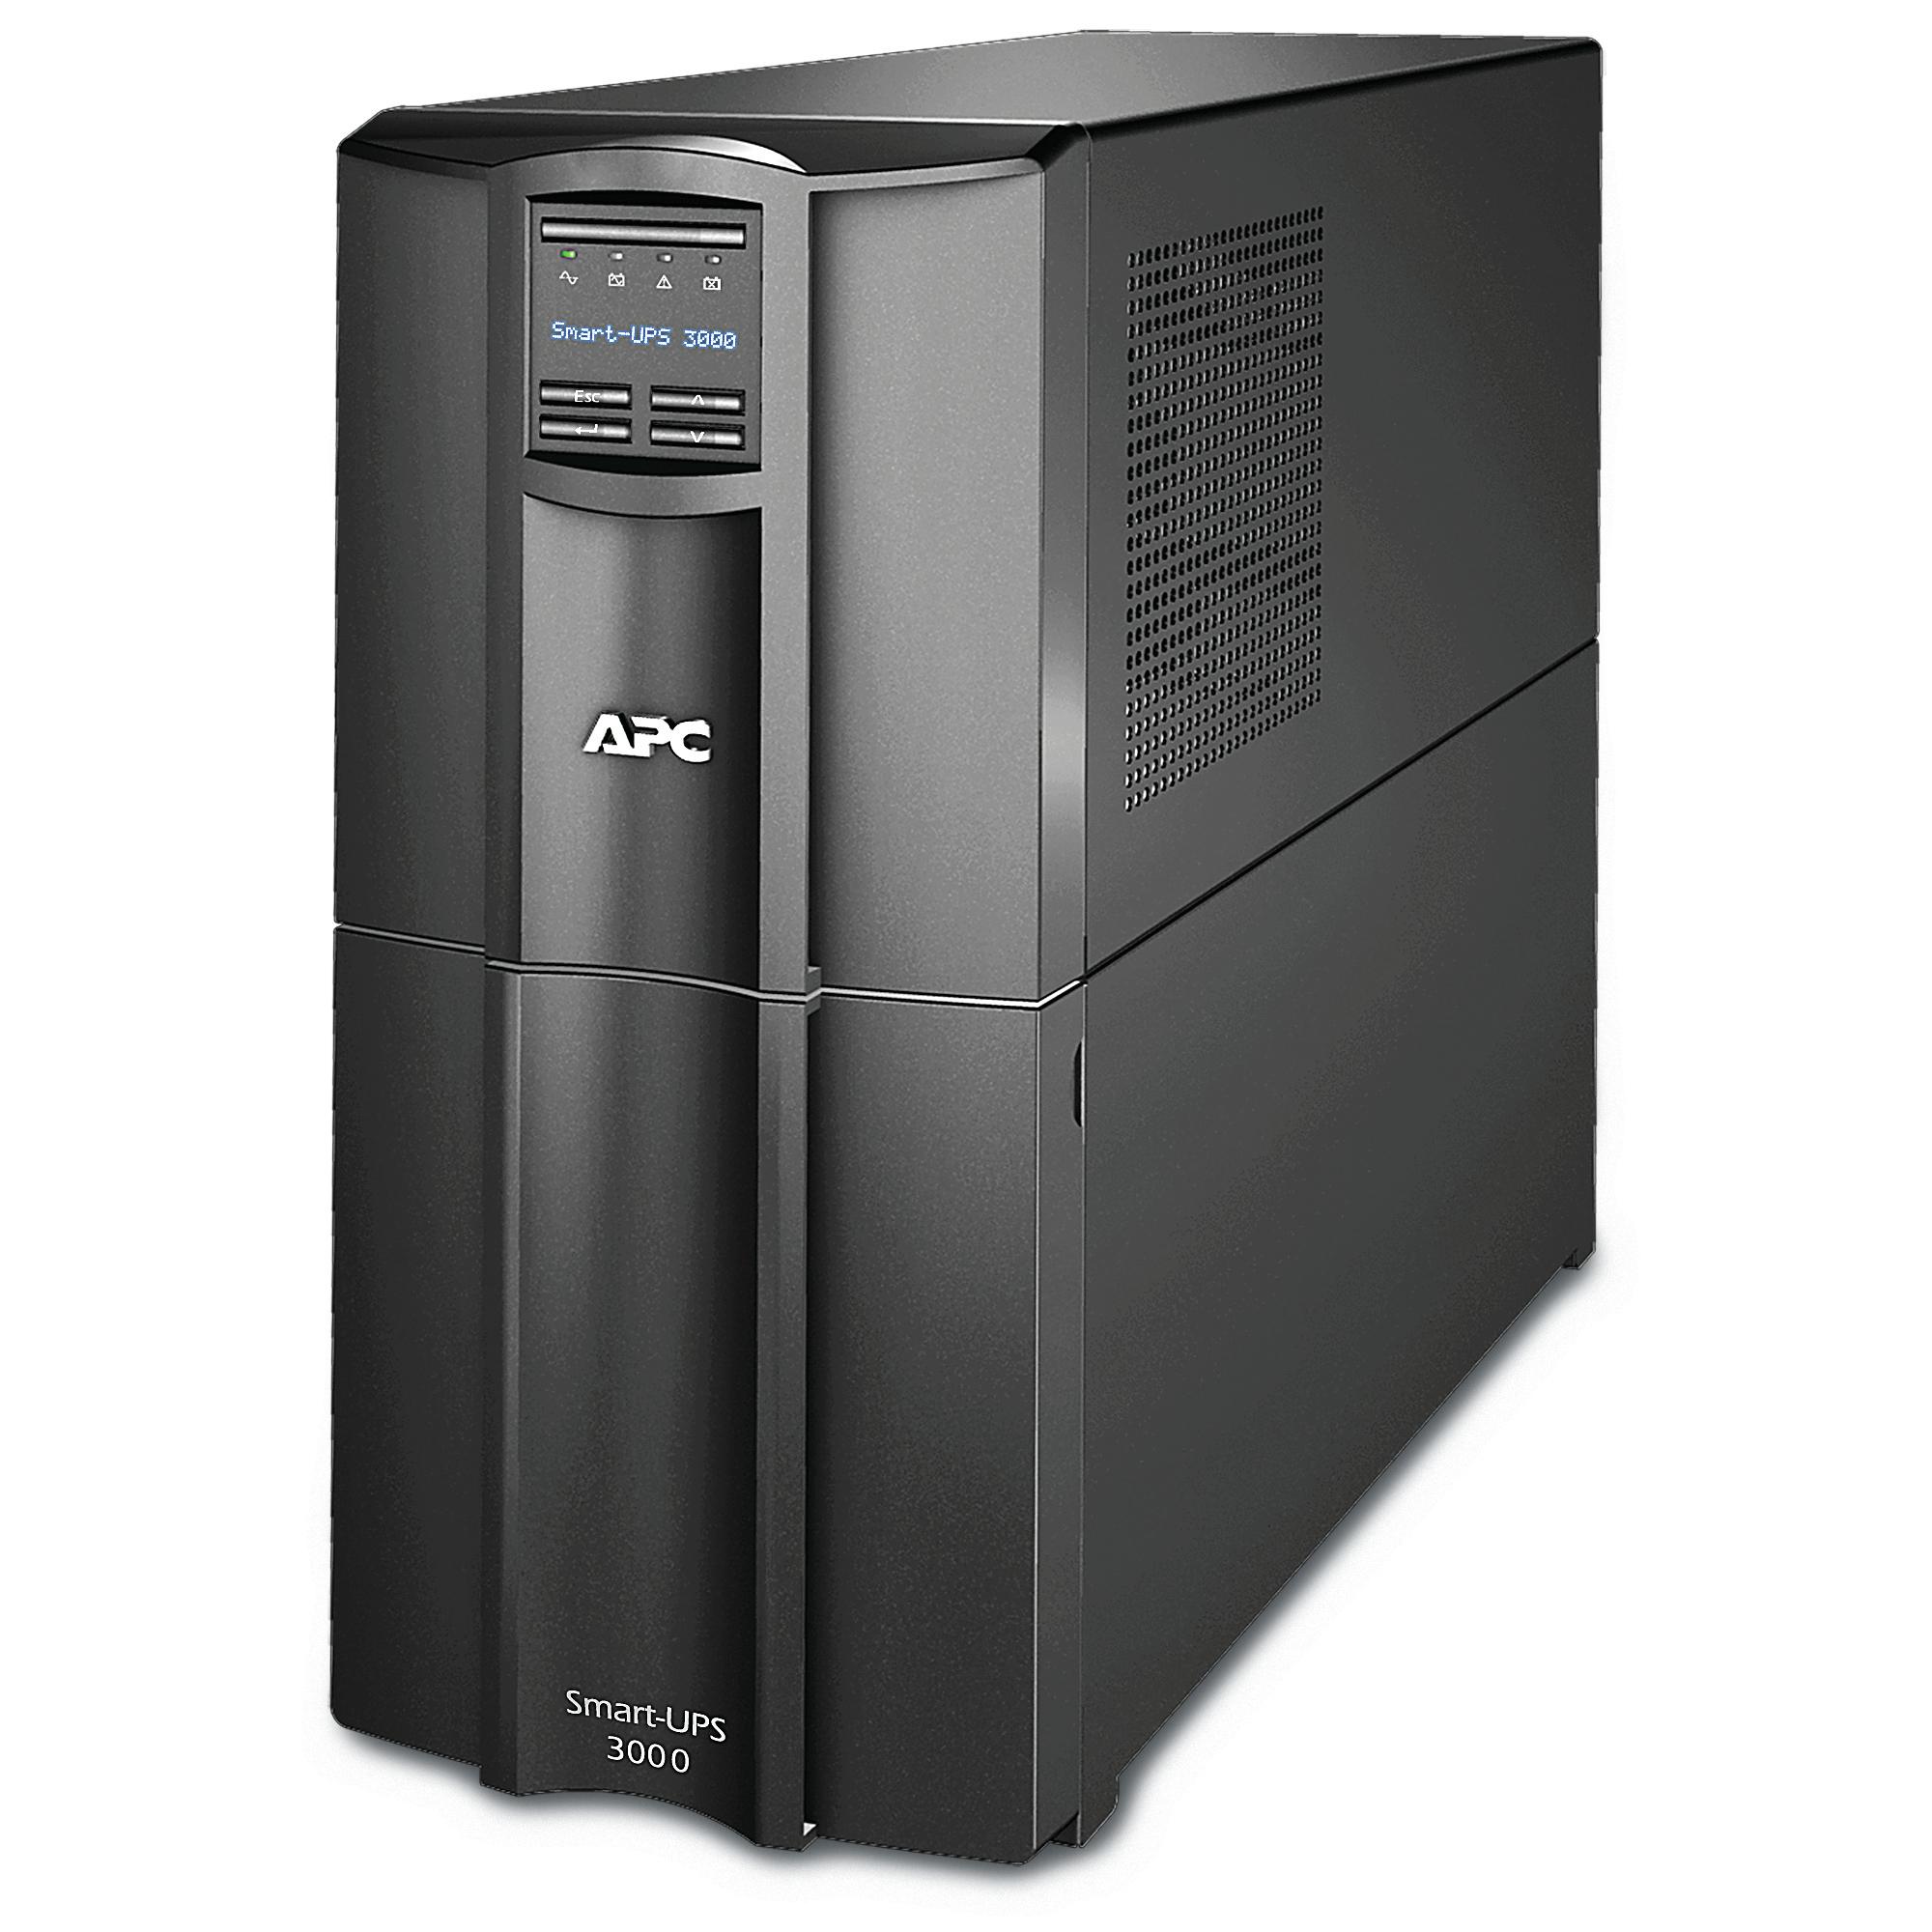 APC SMART-UPS 3000VA LCD 230V WITH SMARTCONNECT Unterbrechungsfreie Stromversorgung UPS Line-Interaktiv 2700 W 9 AC-Ausgänge